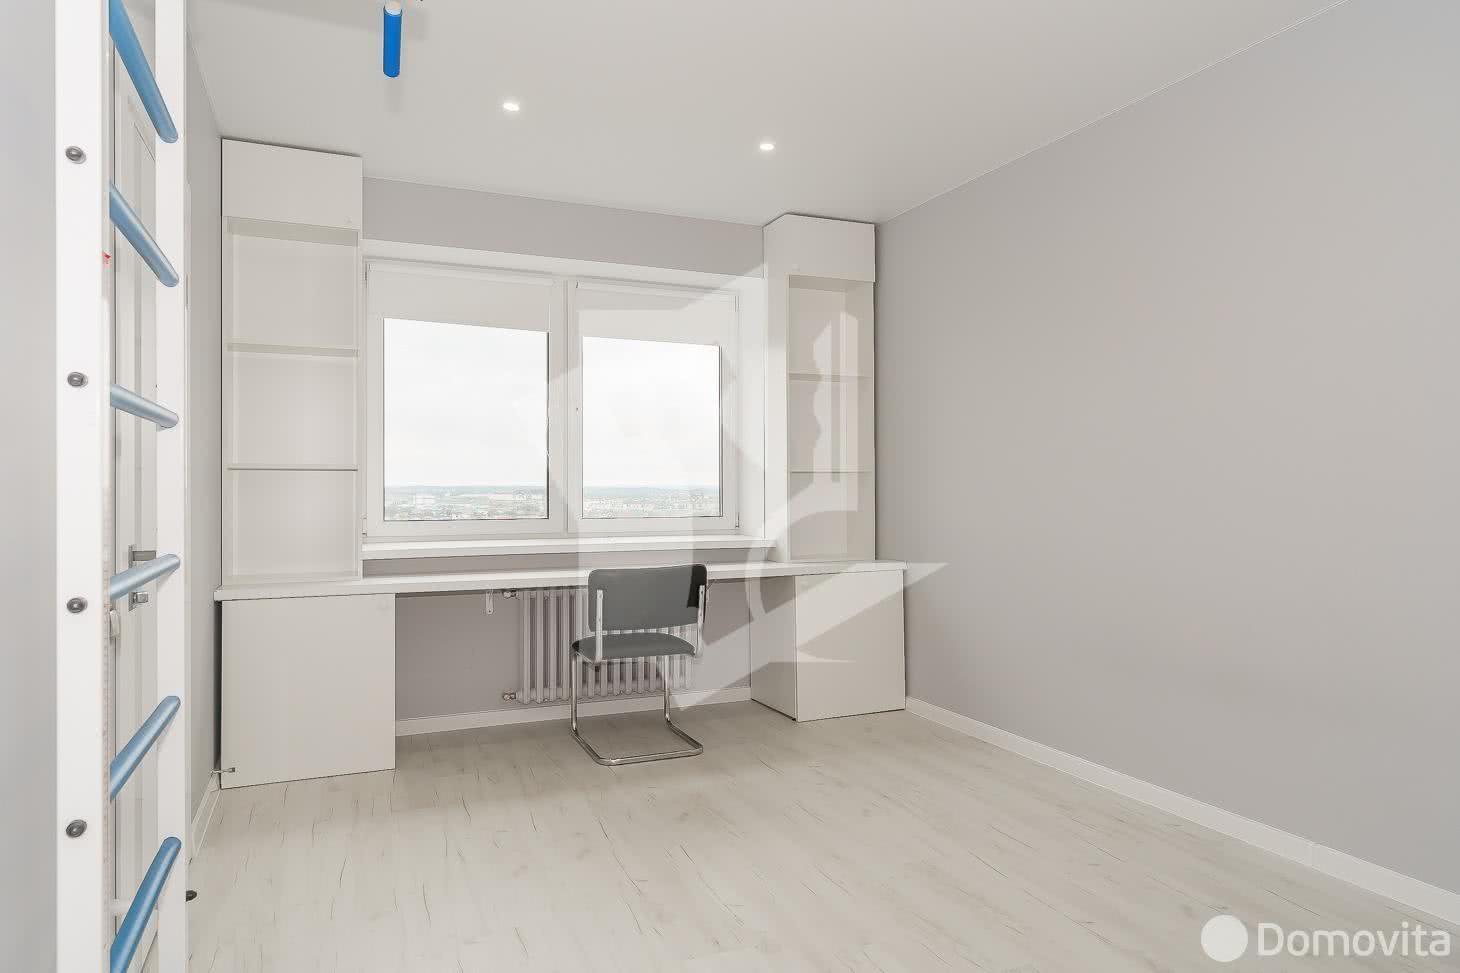 Снять 3-комнатную квартиру в Минске, ул. Мястровская, д. 28 - фото 5